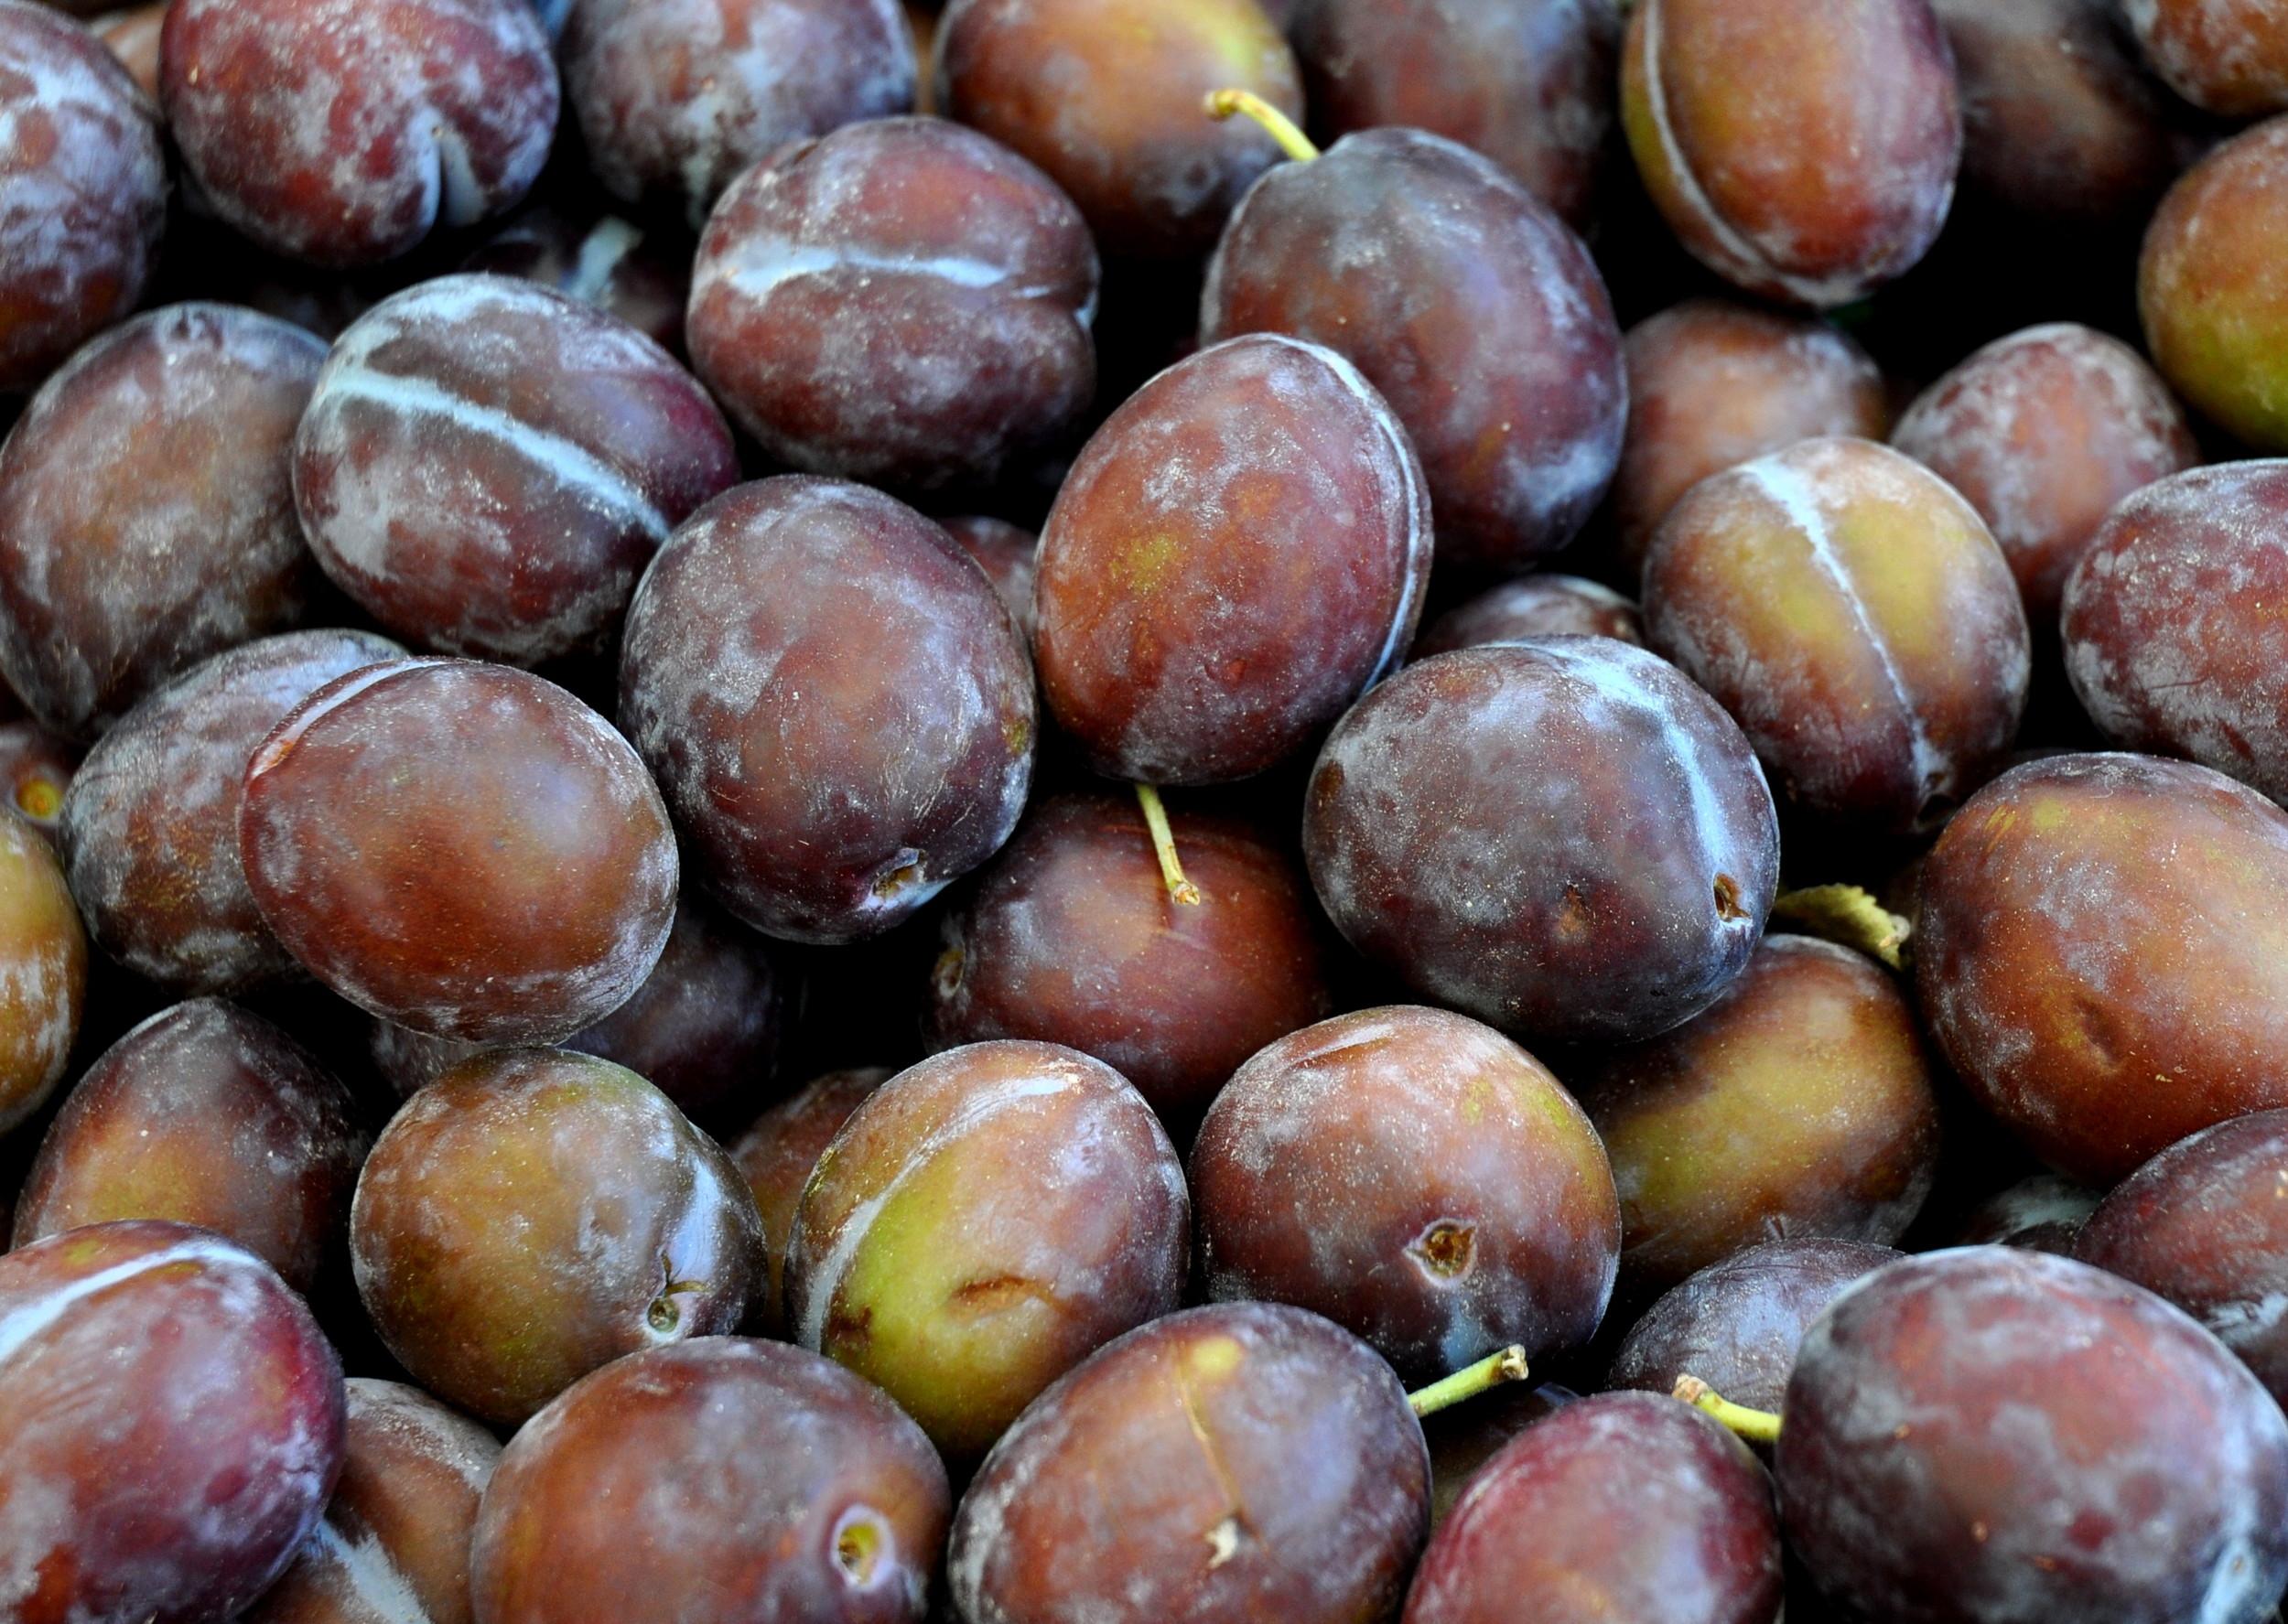 Early Italian prunes from Magana Farms. Photo copyright 2012 by Zachary D. Lyons.